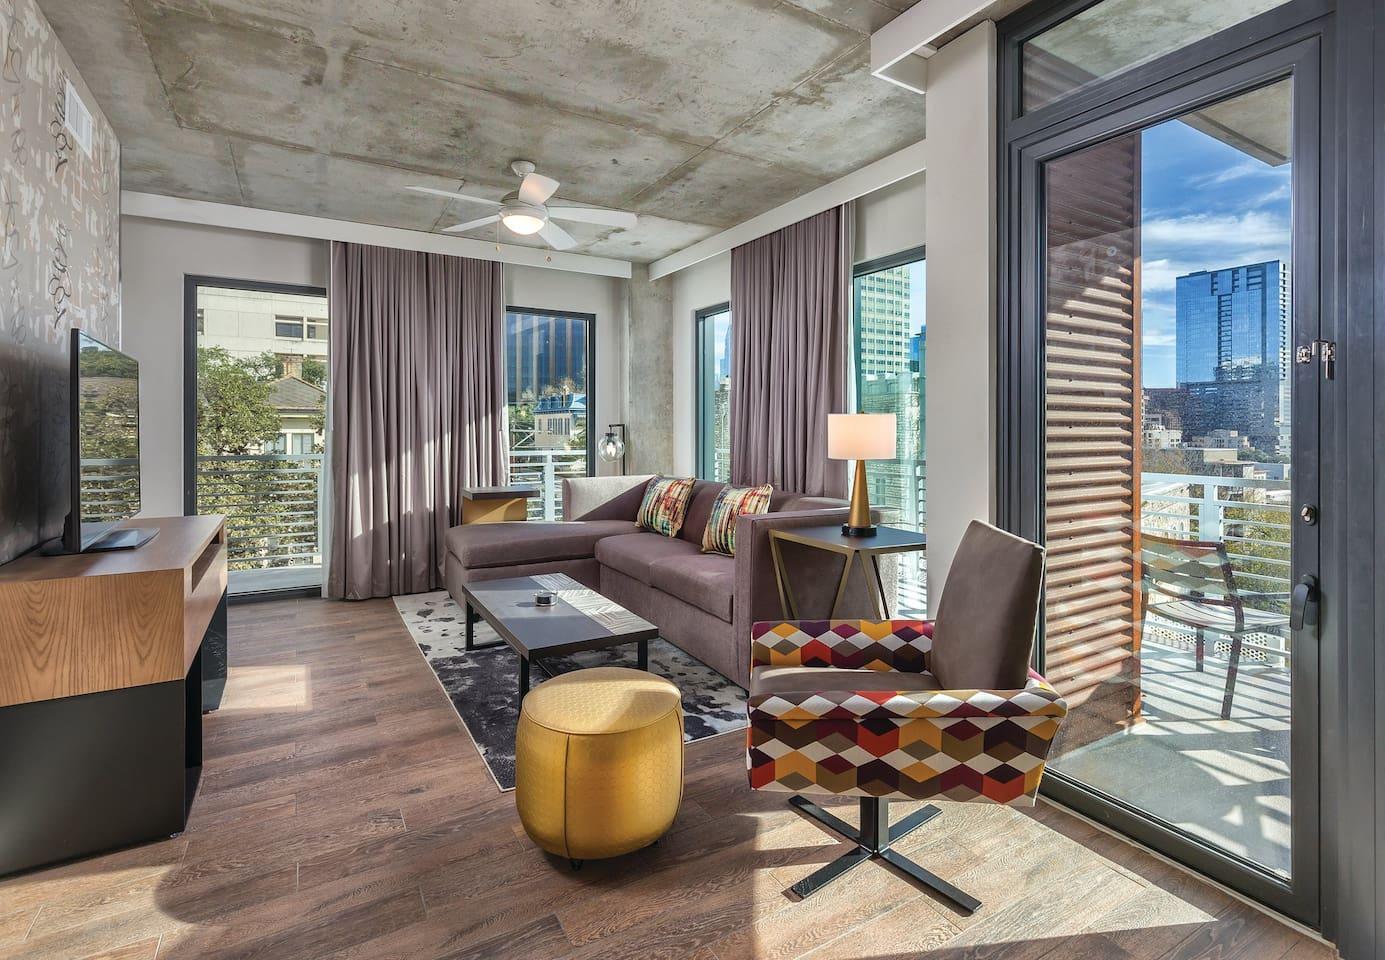 Living room and patio / balcony